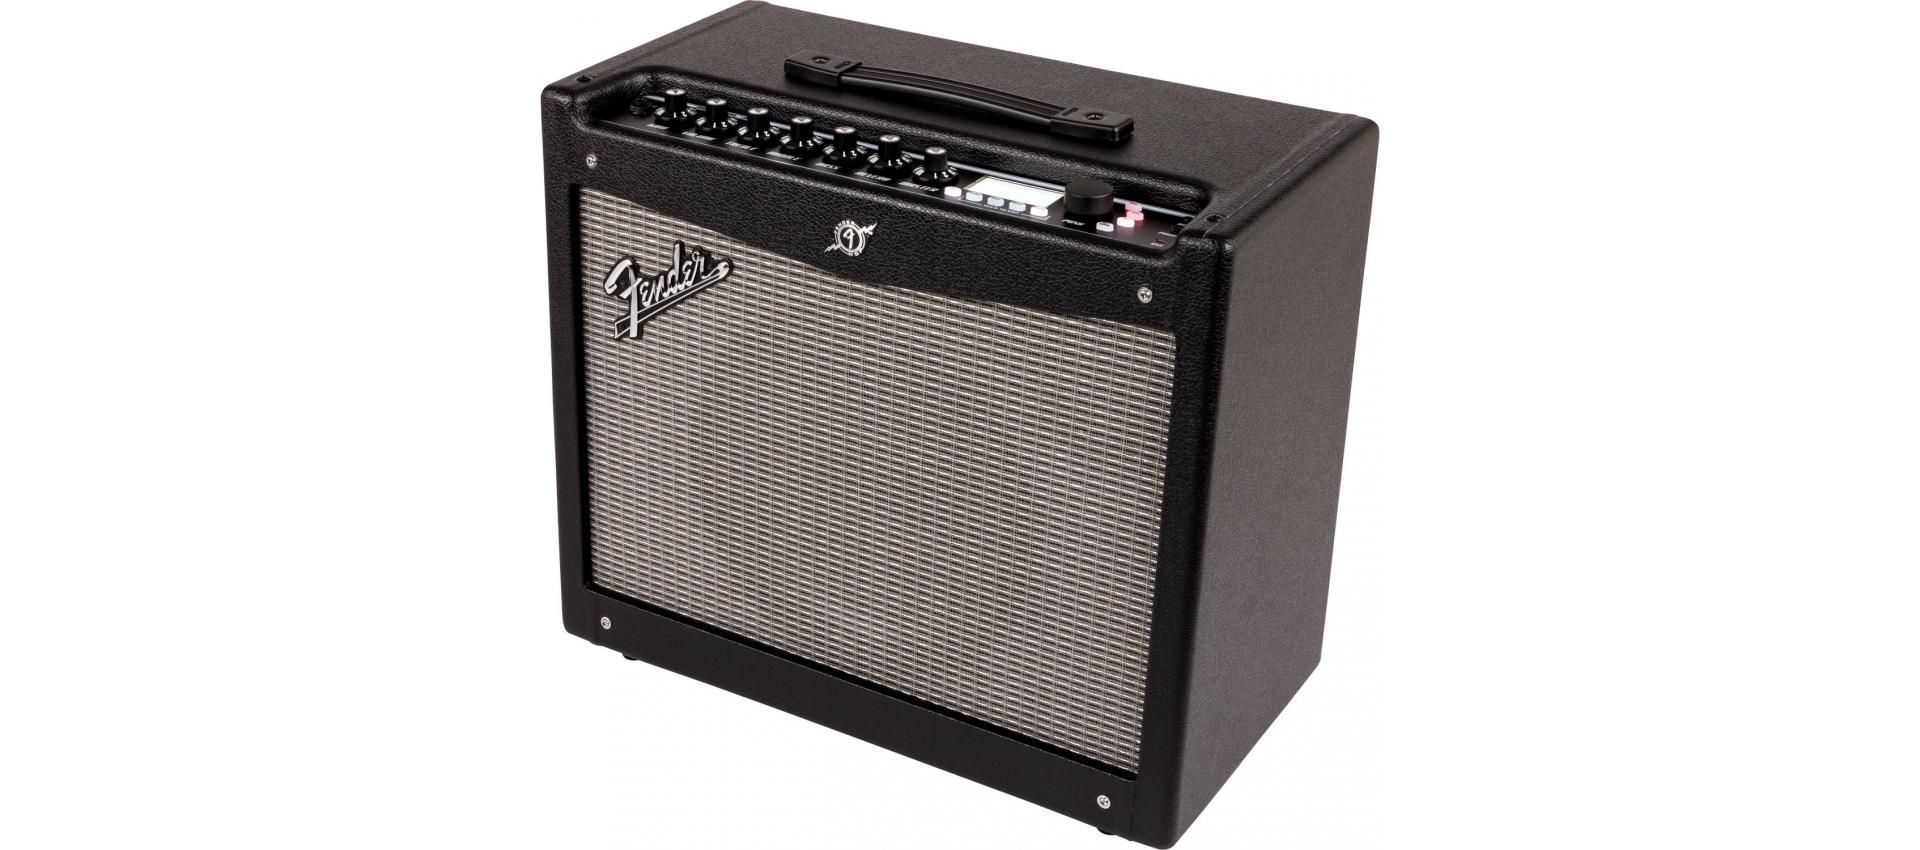 fender mustang iii v2 combo programmabile 100w combo per chitarra elettrica. Black Bedroom Furniture Sets. Home Design Ideas